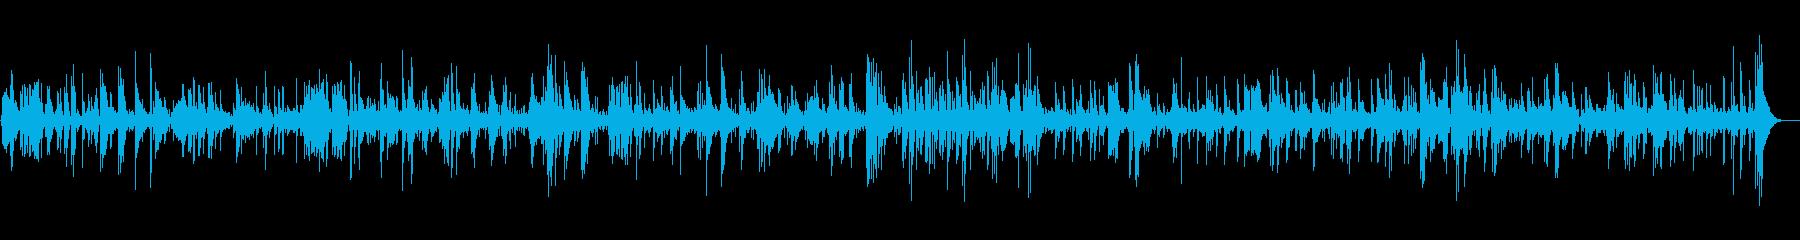 JAZZ|キラキラ おしゃれ|映像・店舗の再生済みの波形